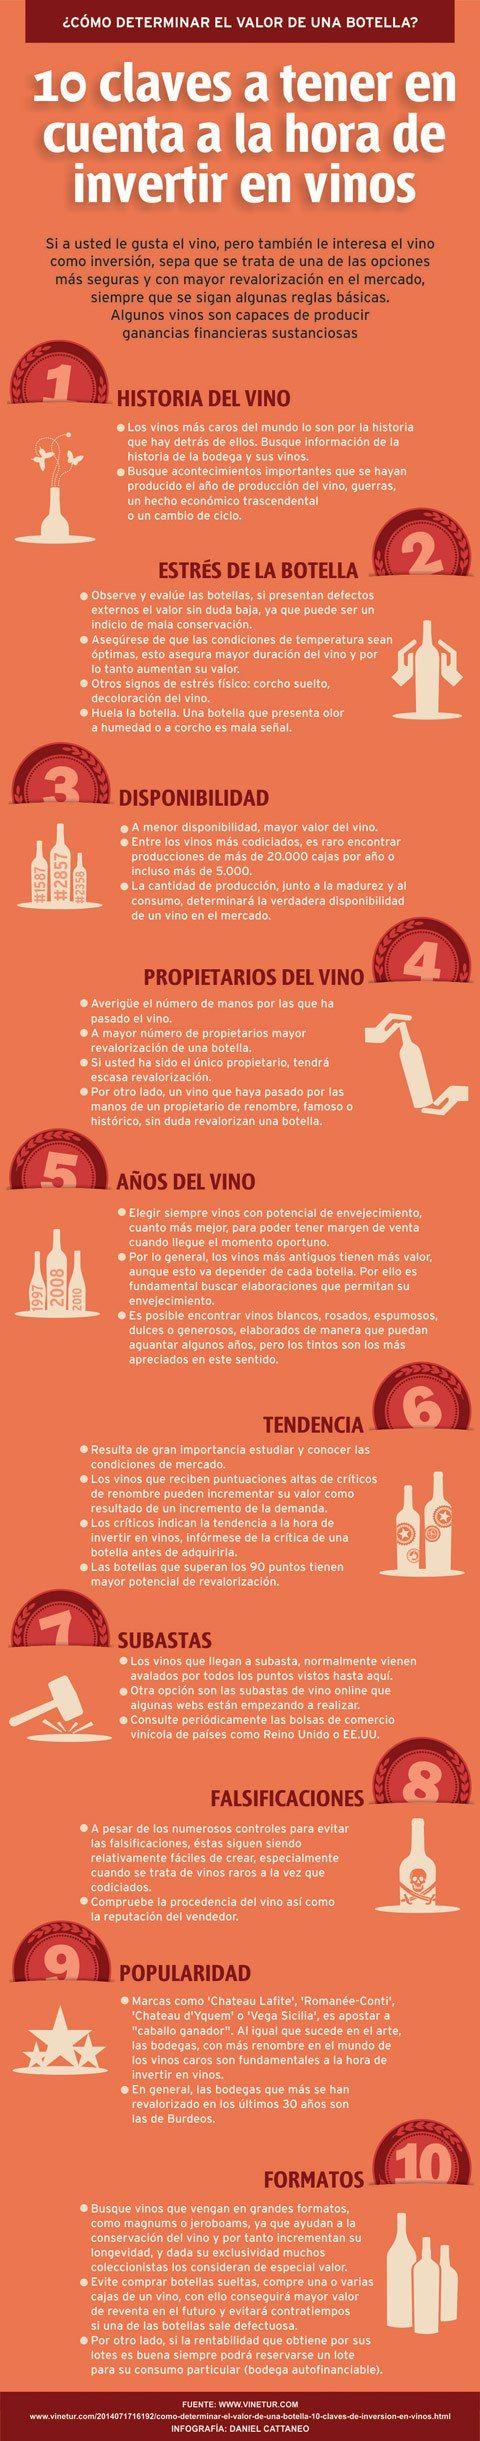 10 claves para invertir en vinos. #infografia